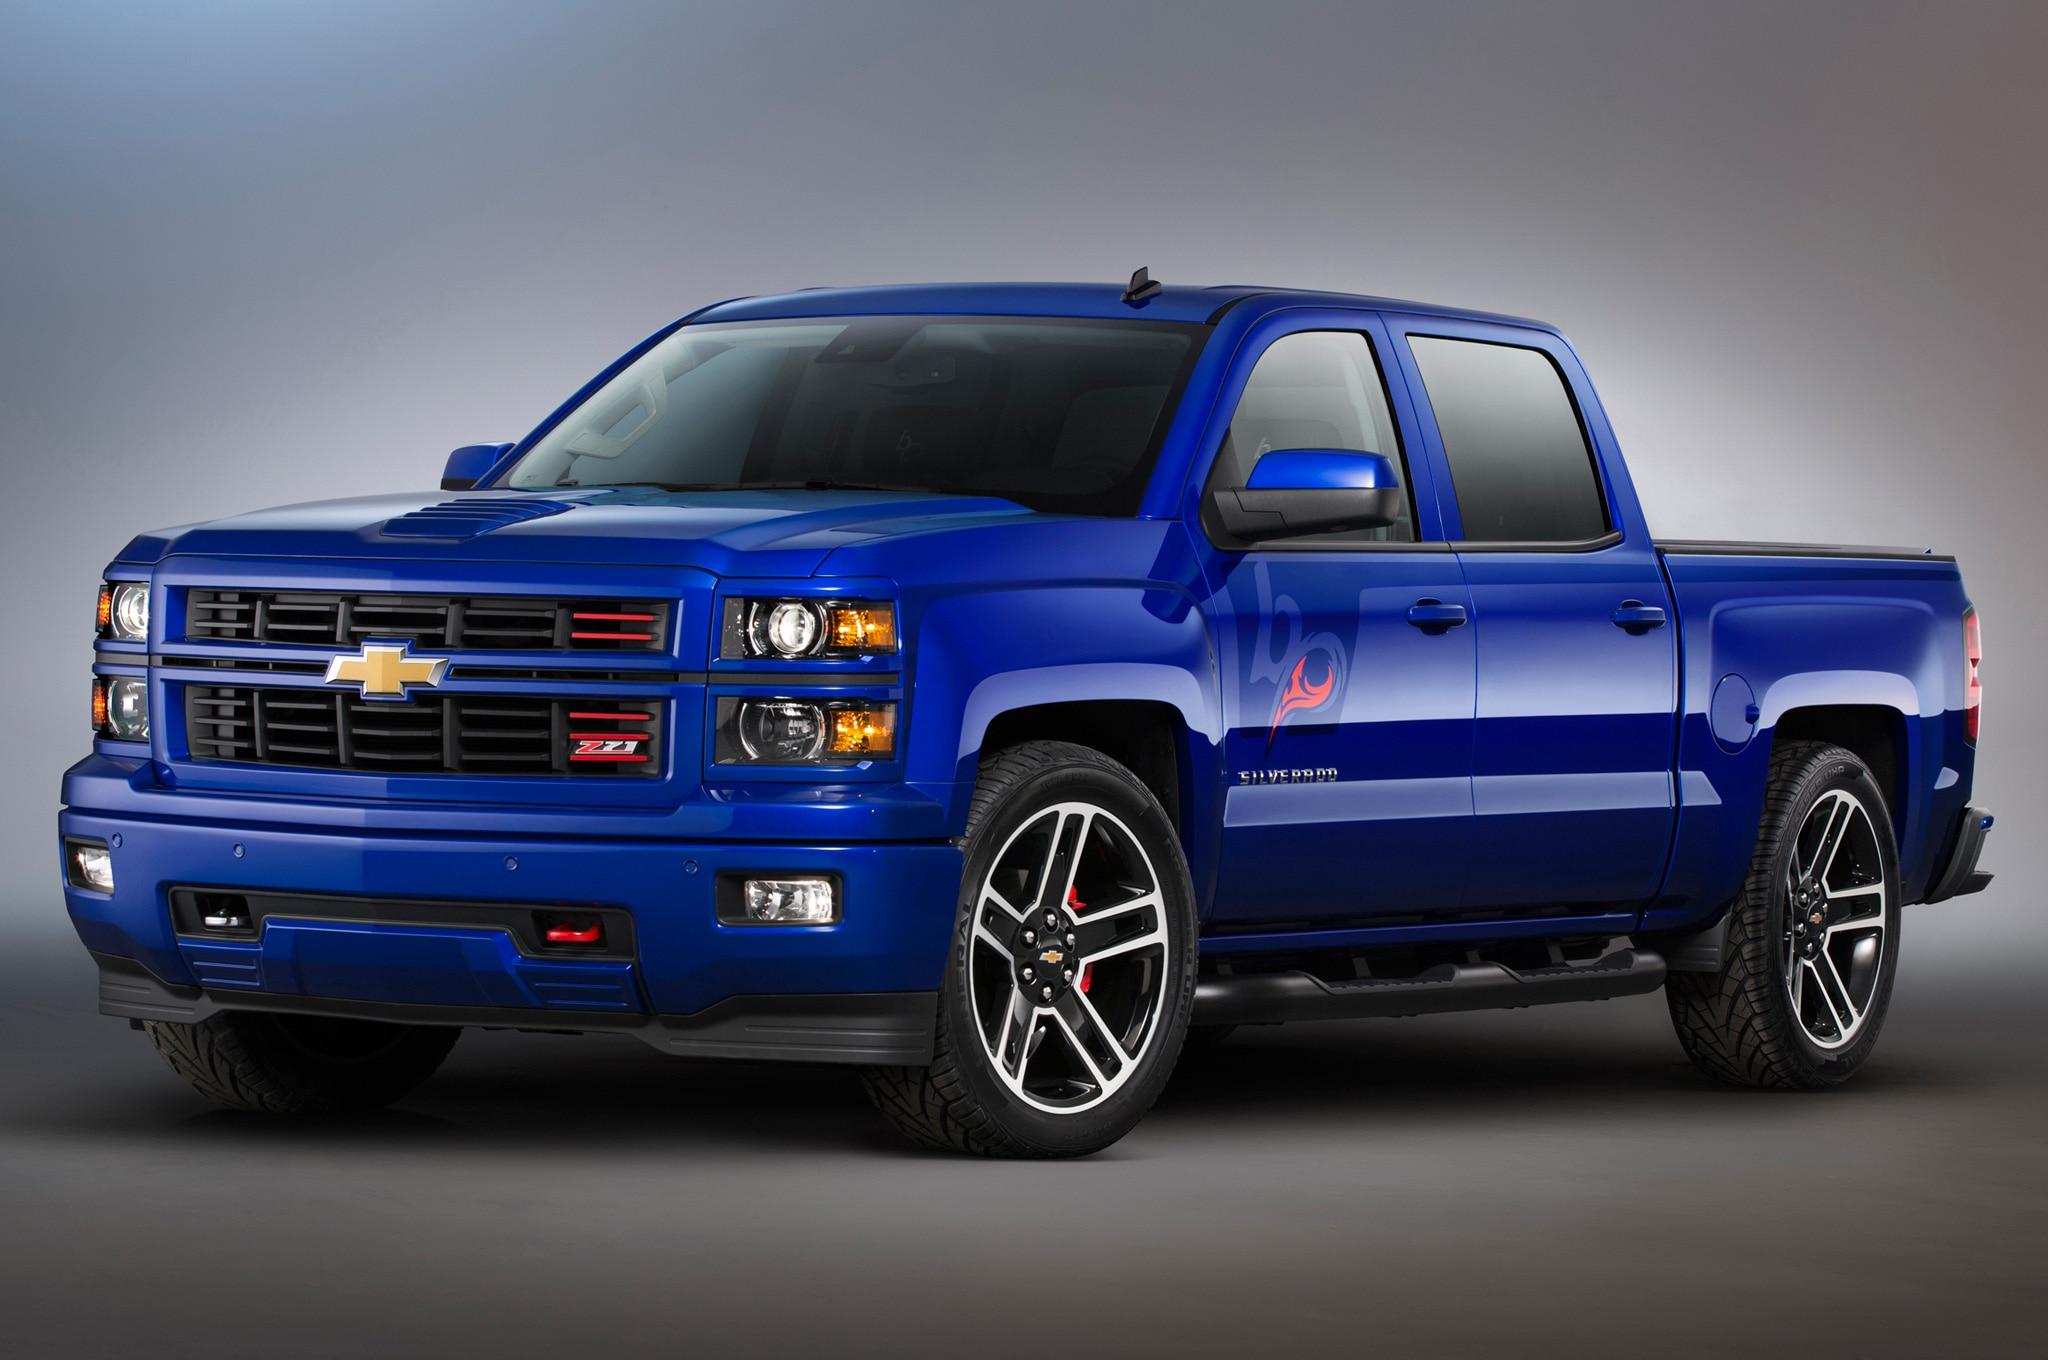 SEMA 2013: Chevrolet Rolls Out Customized 2014 Silverado ...